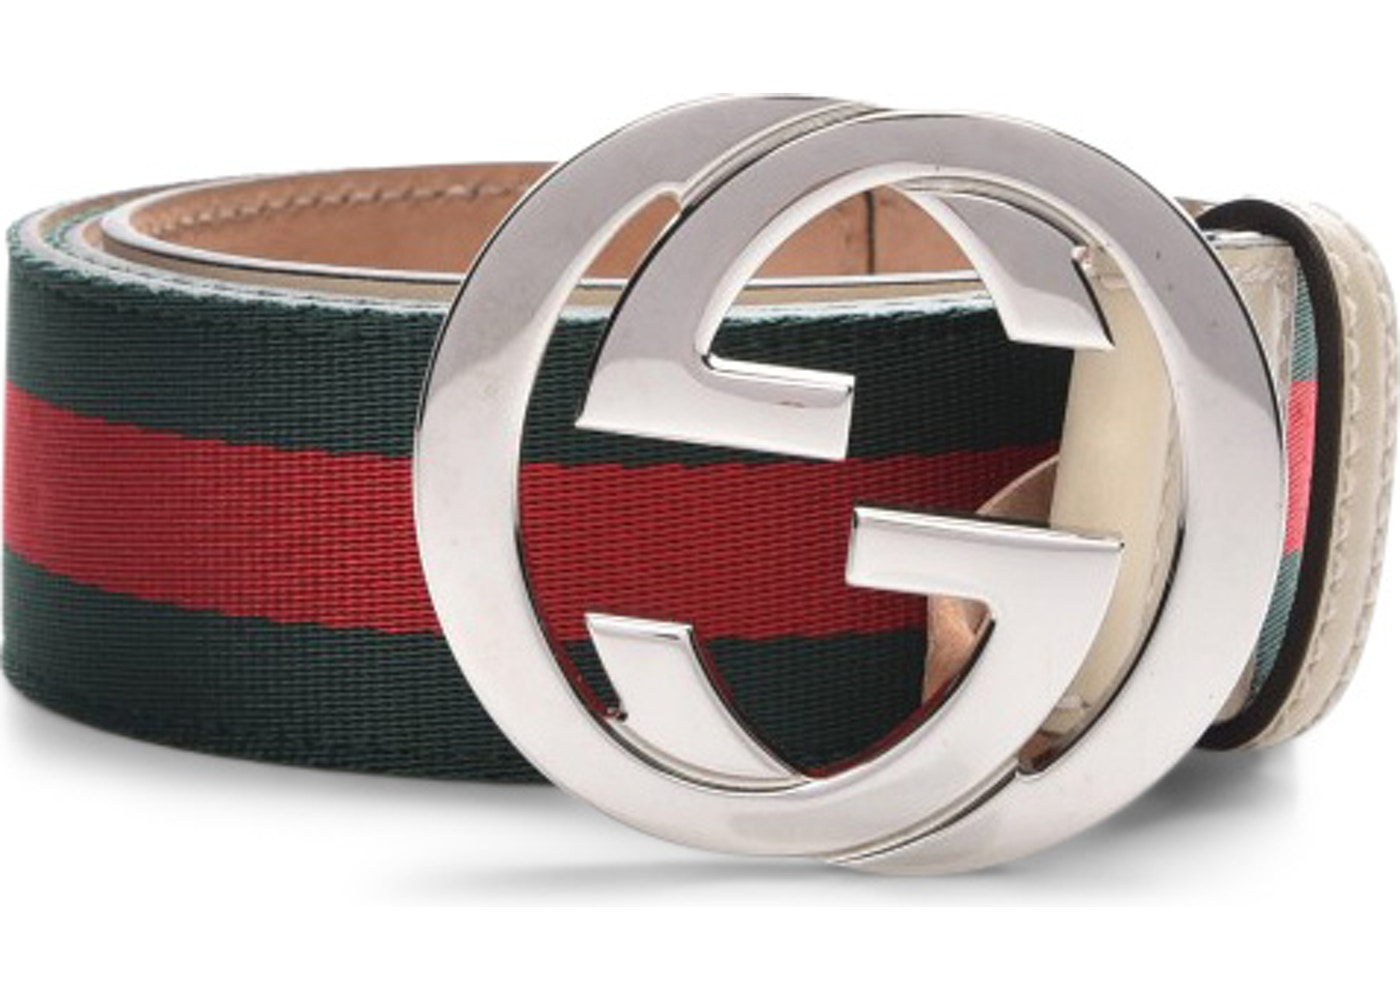 33b56f141e59 Gucci Interlocking G Belt Web Green/Red. Web Green/Red